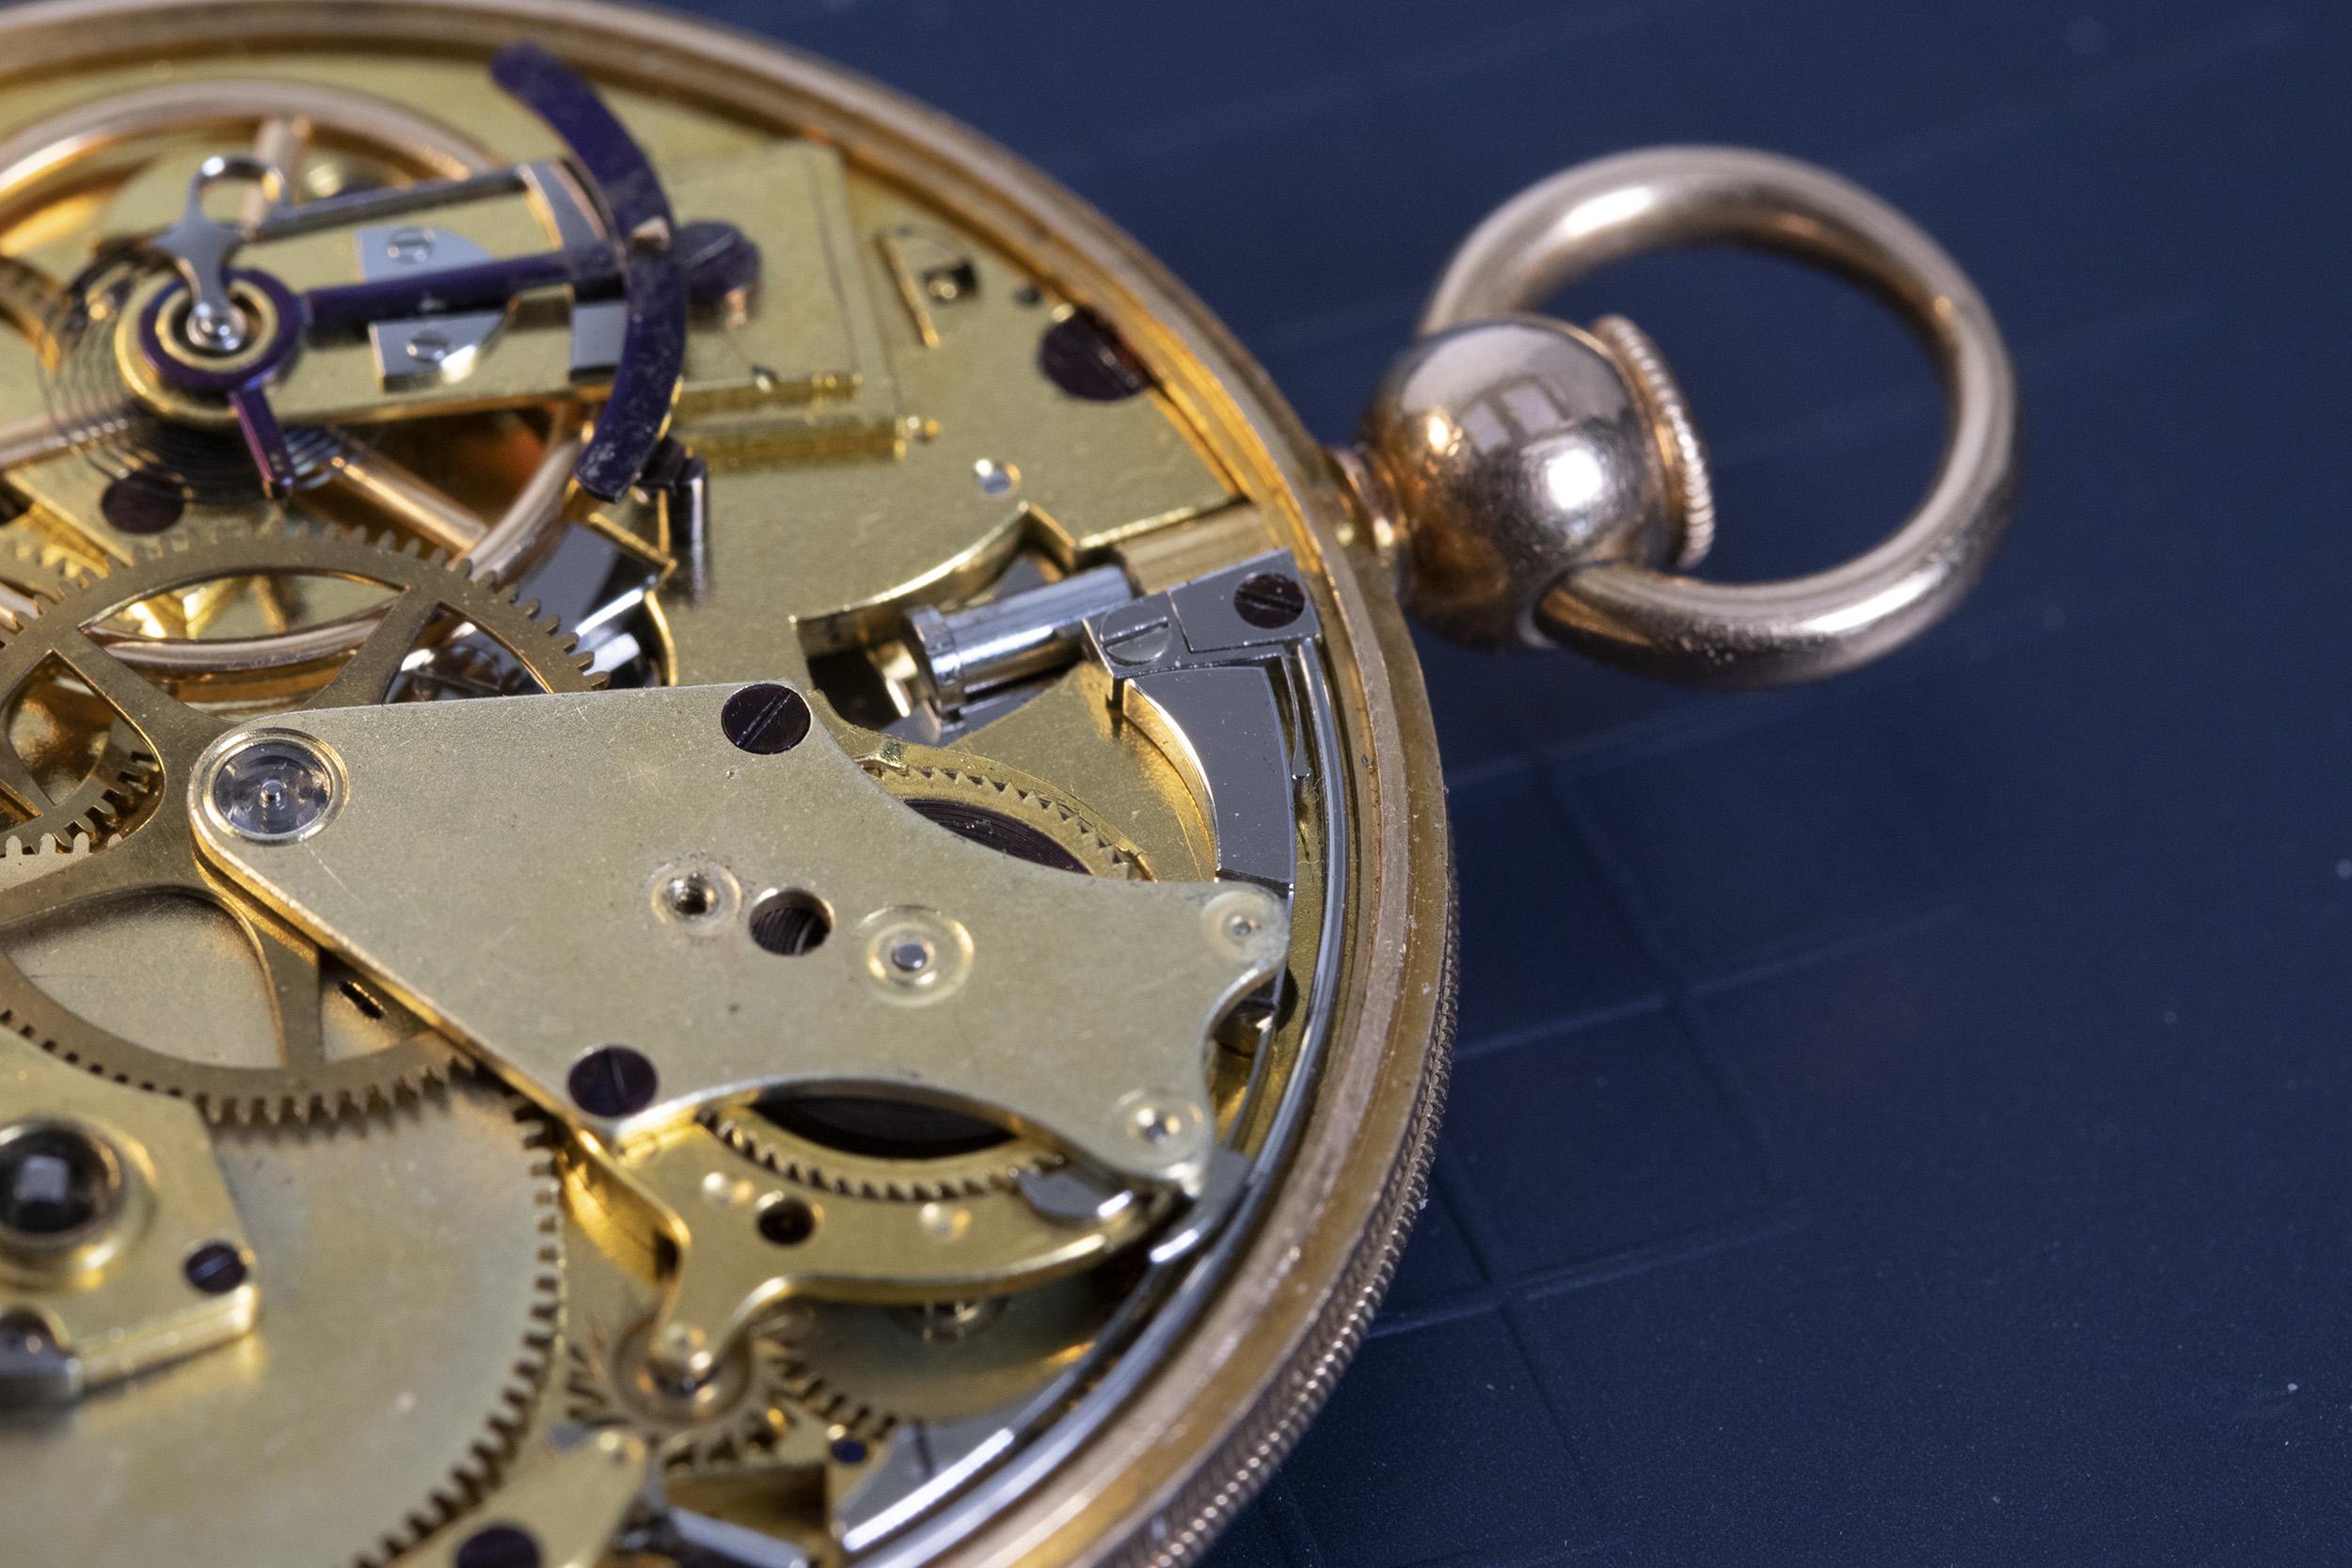 Breguet N°3190, vendue en 1819 au Baron de Vietinghoff 46958299595_0b0b377bdc_o